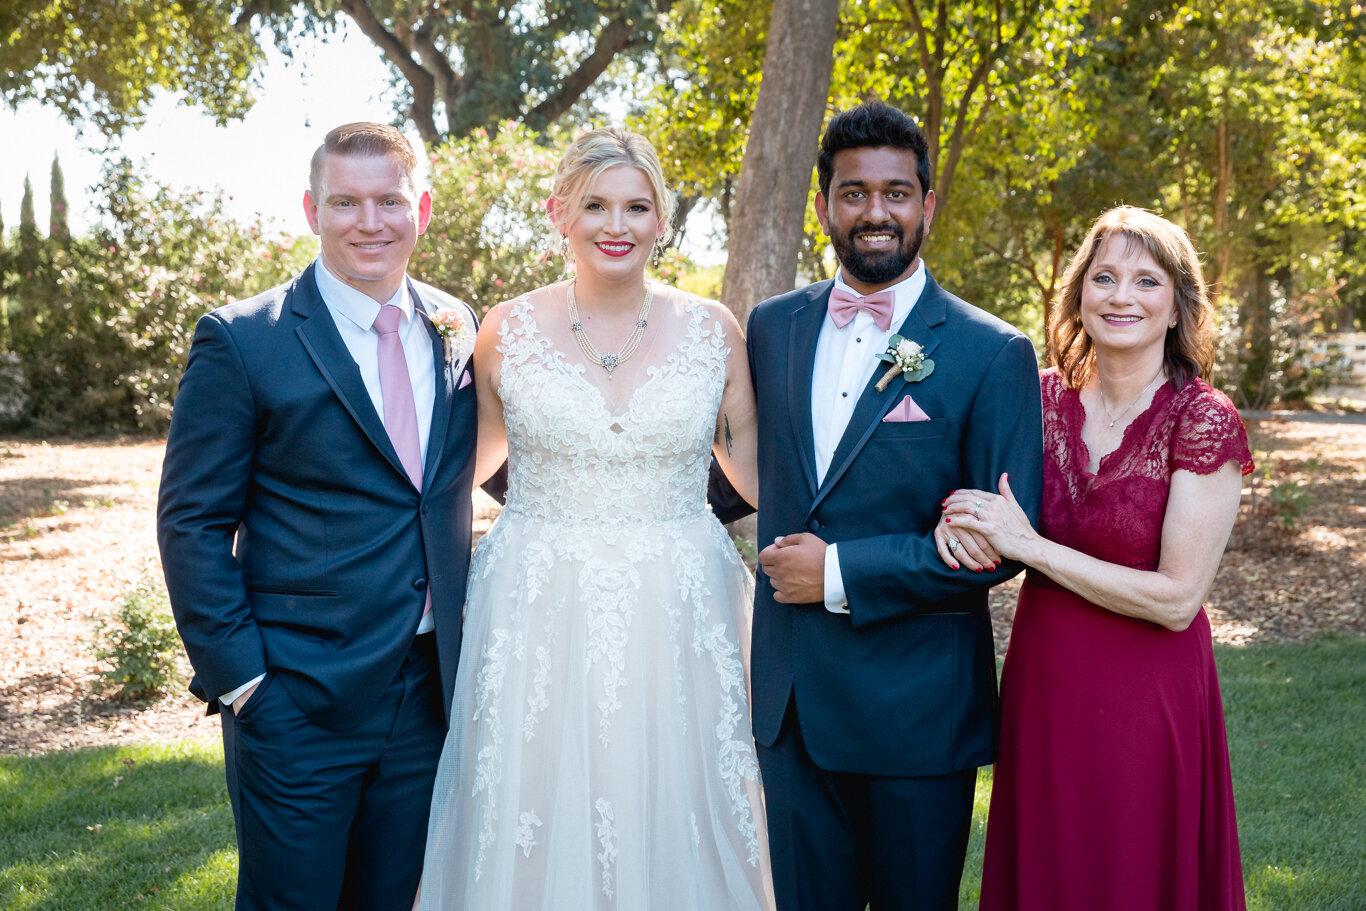 2019.08.24_Emily-Ashir-Wedding-at-the-Maples-5519.jpg